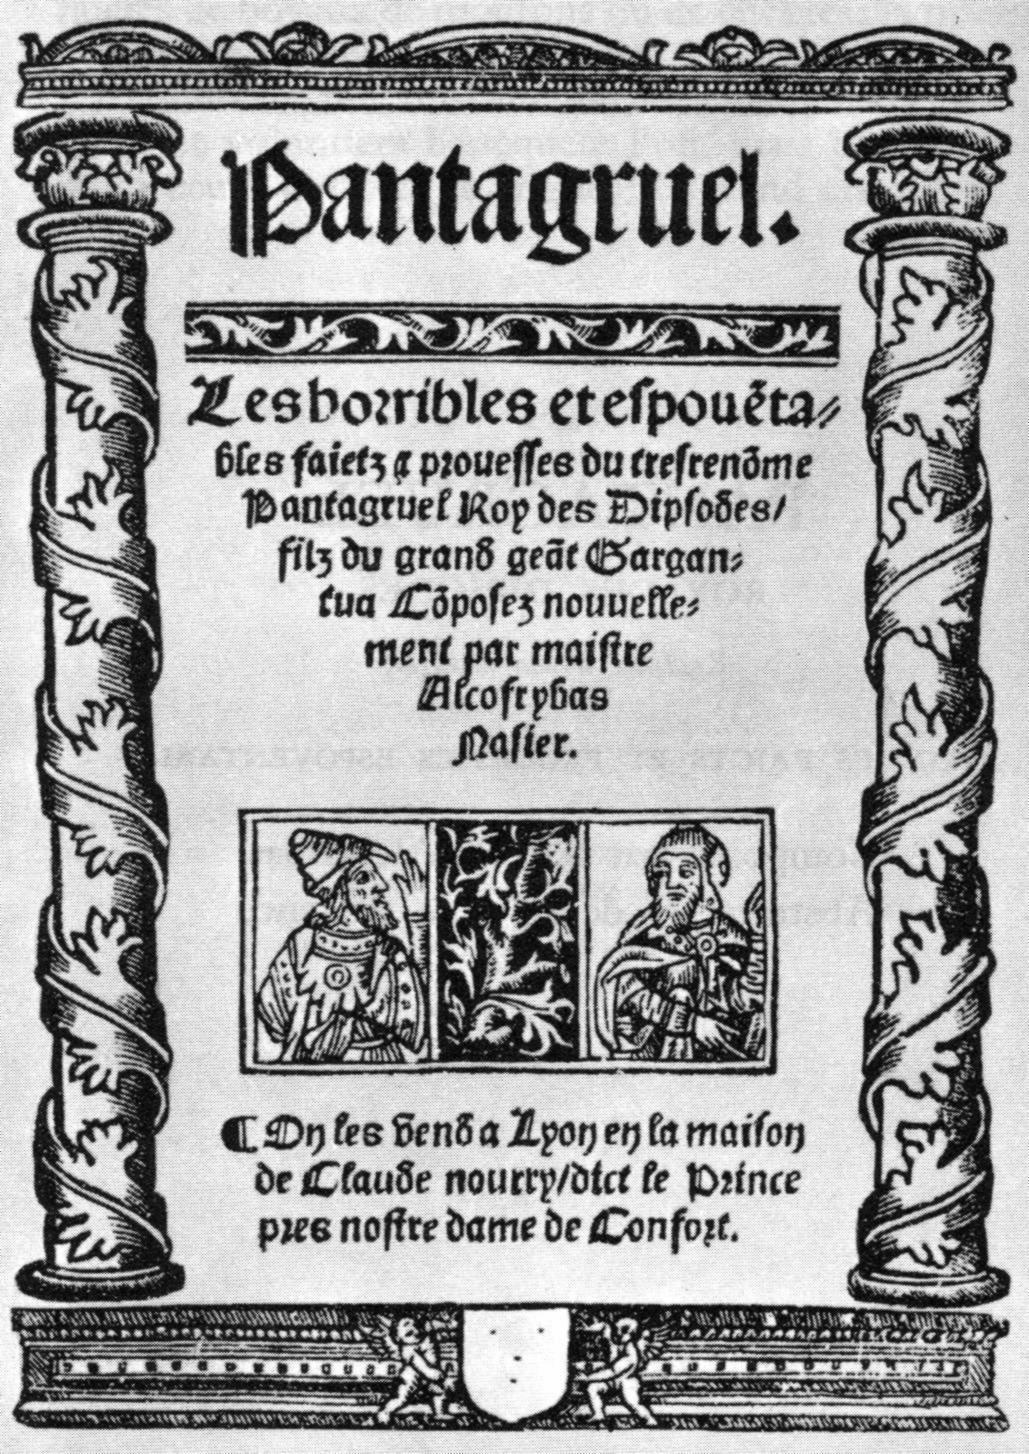 File:Pantagruel 1532 tp.jpg